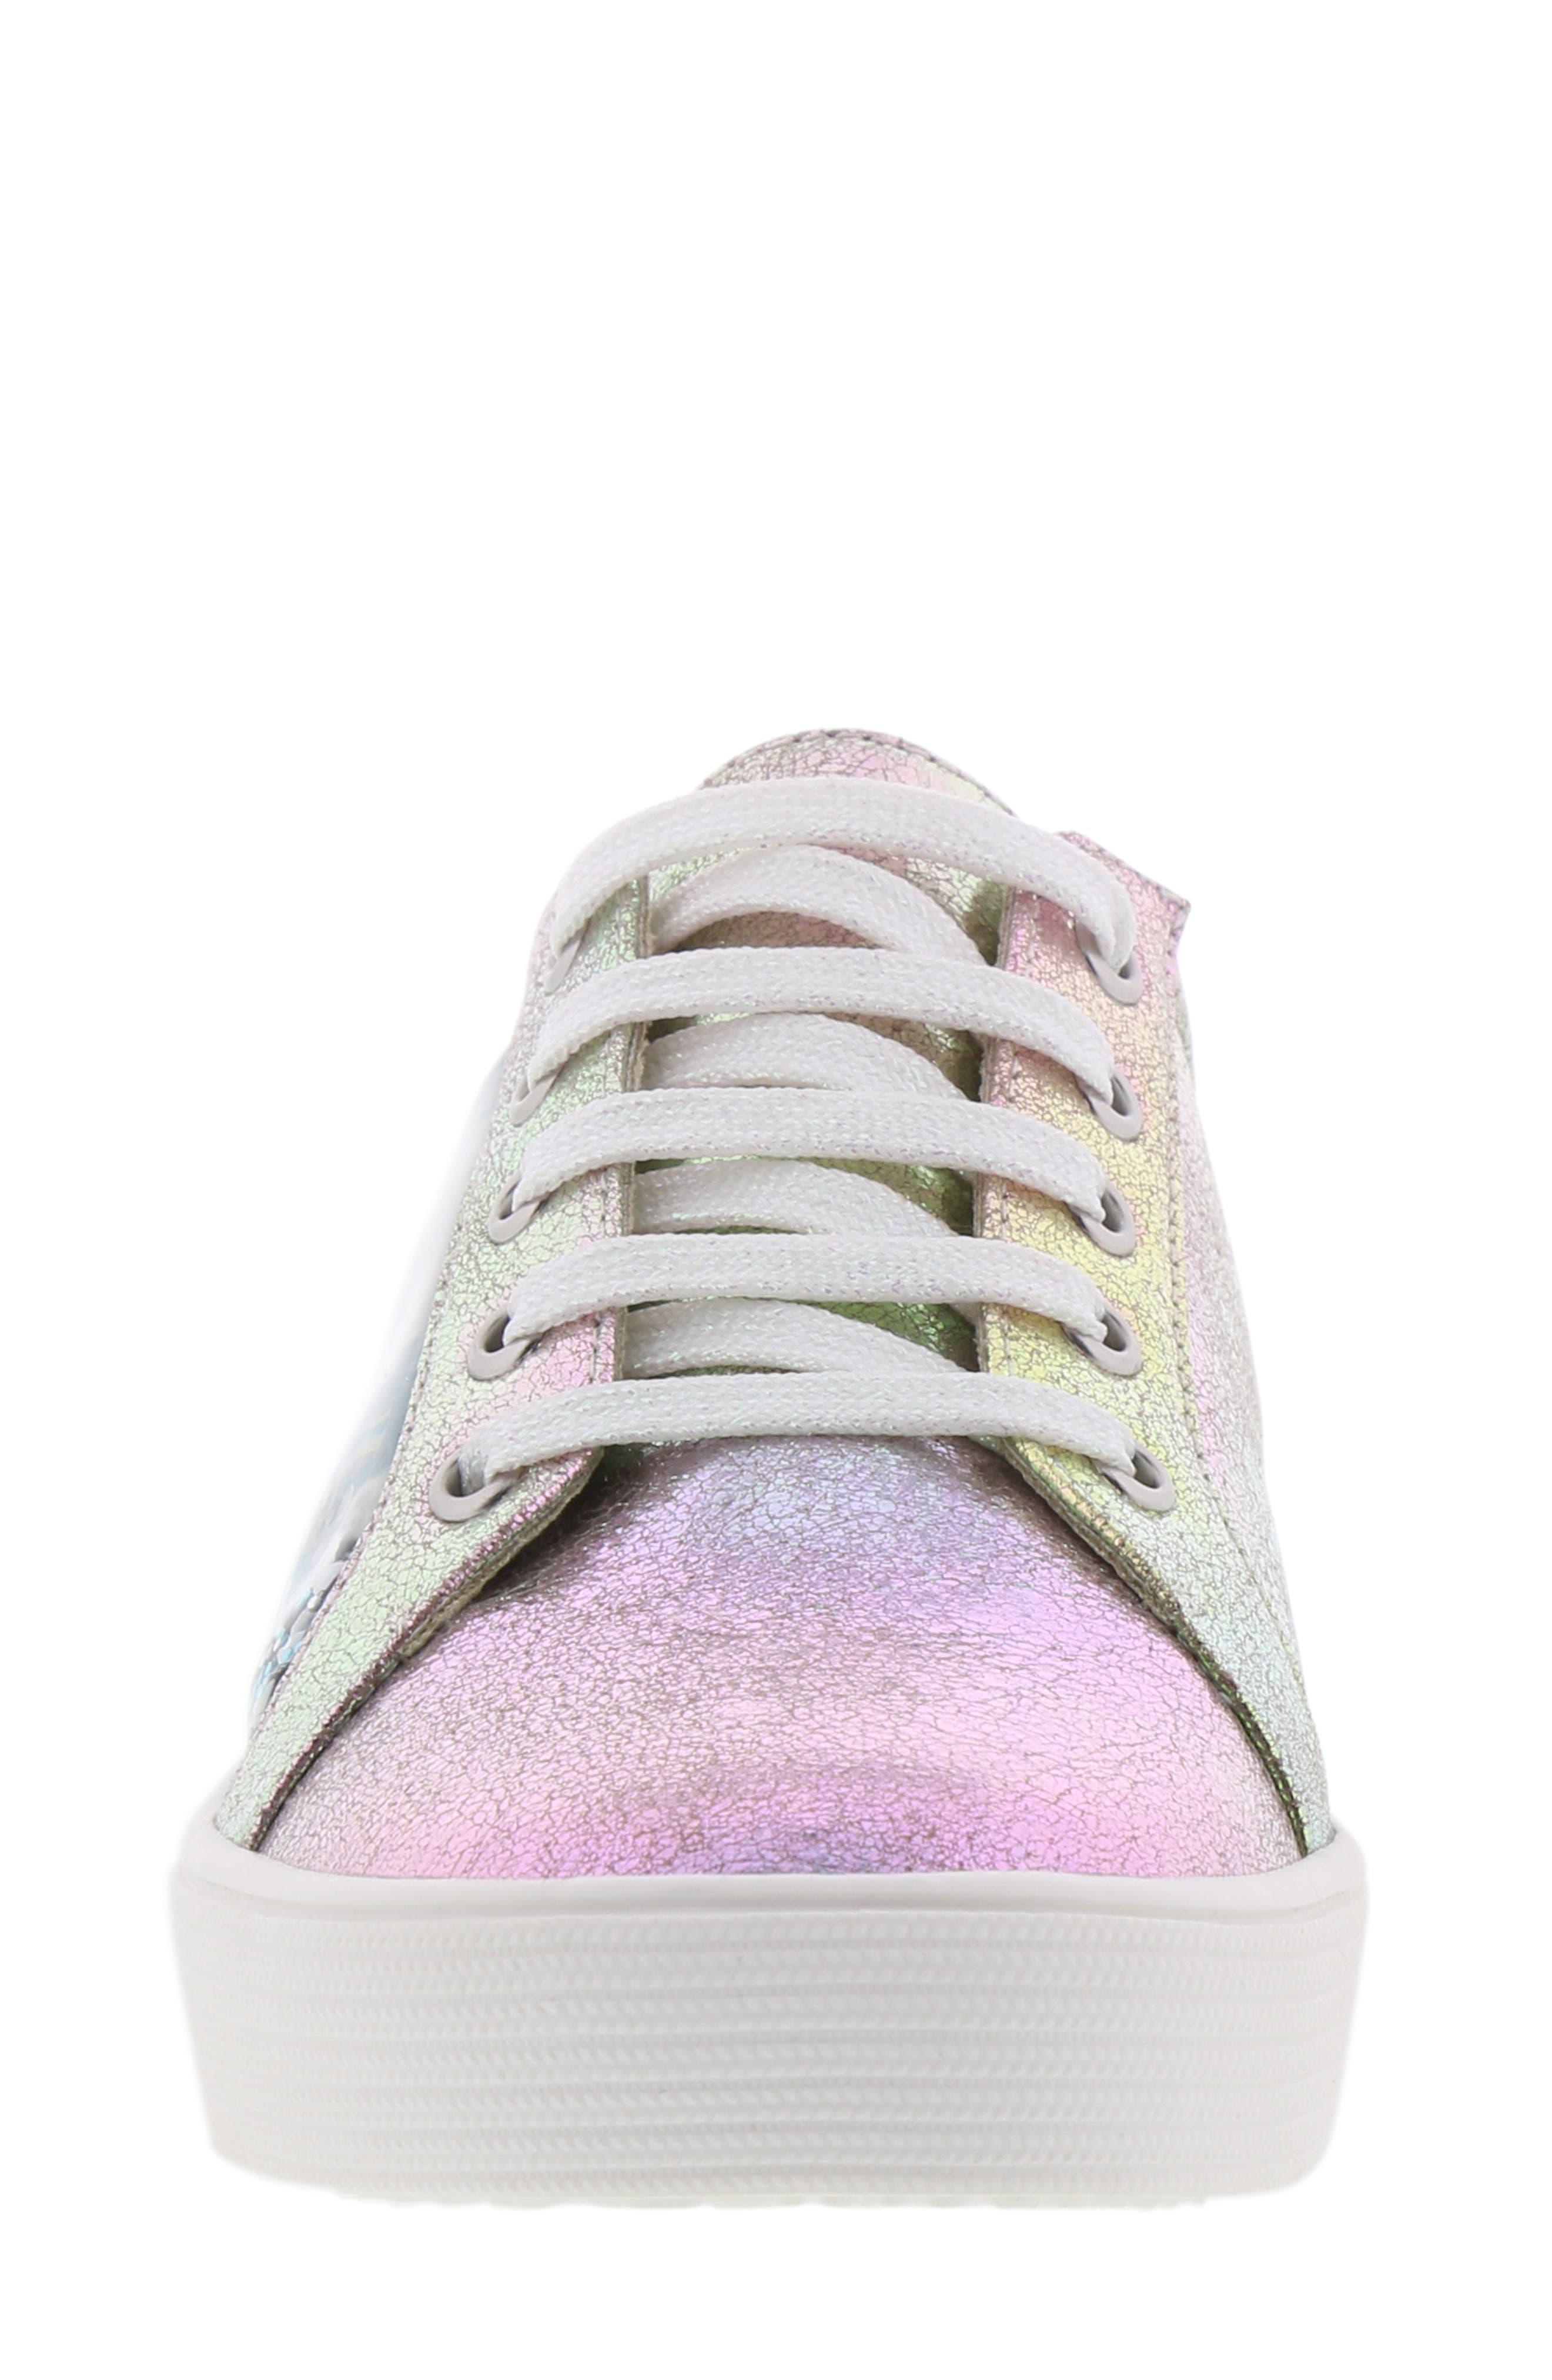 Bella Aqua Slip-On Sneaker,                             Alternate thumbnail 4, color,                             GASOLINE IRIDESCENT